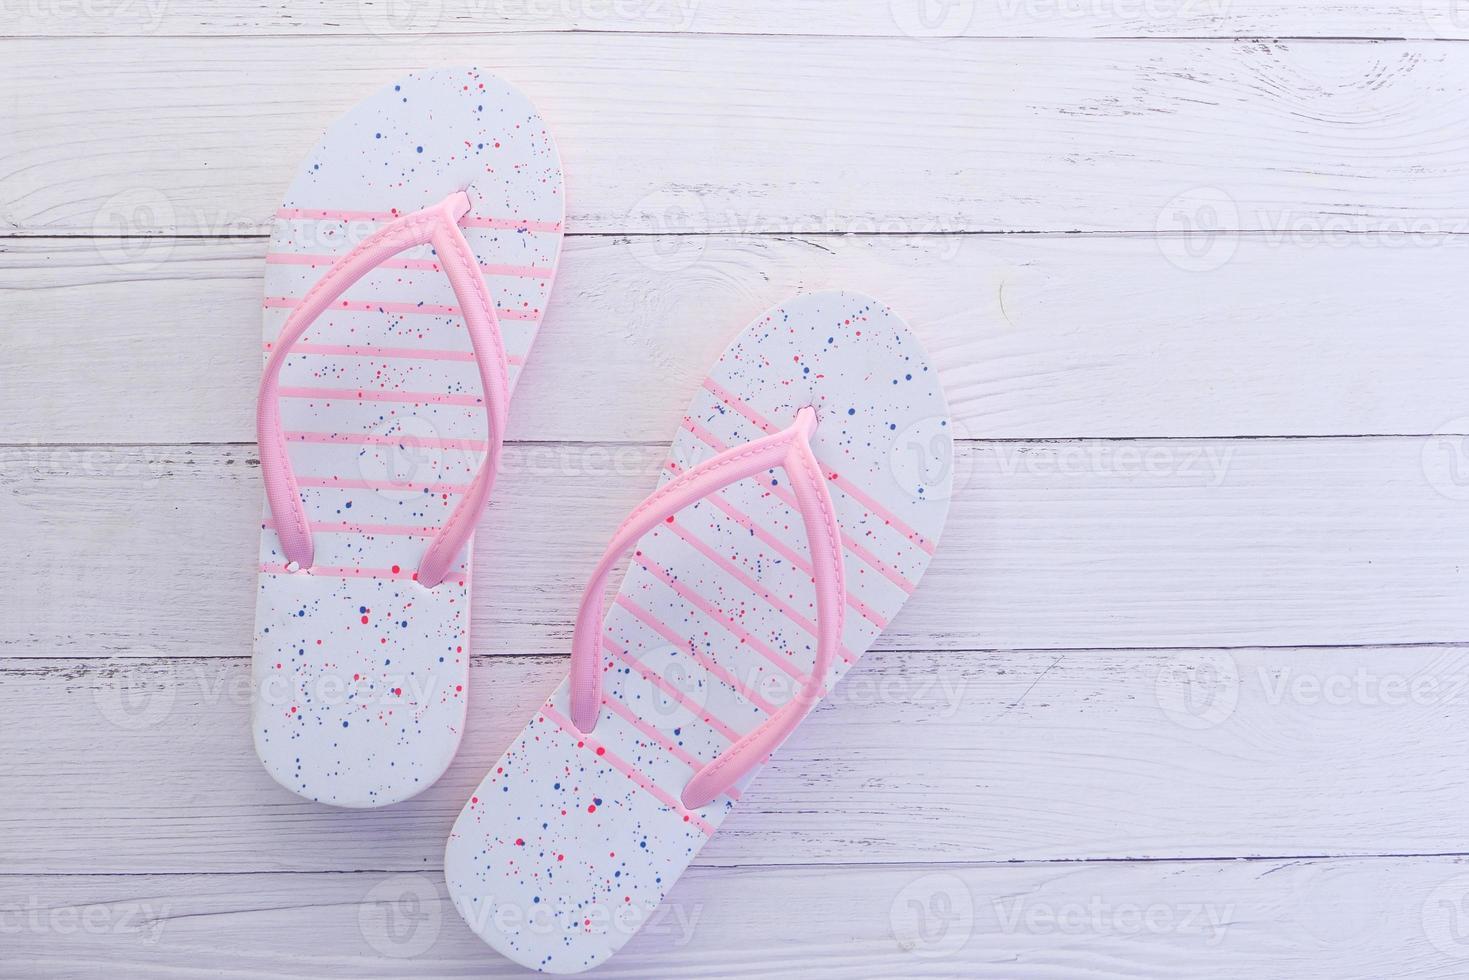 Pink flip flop sandals photo